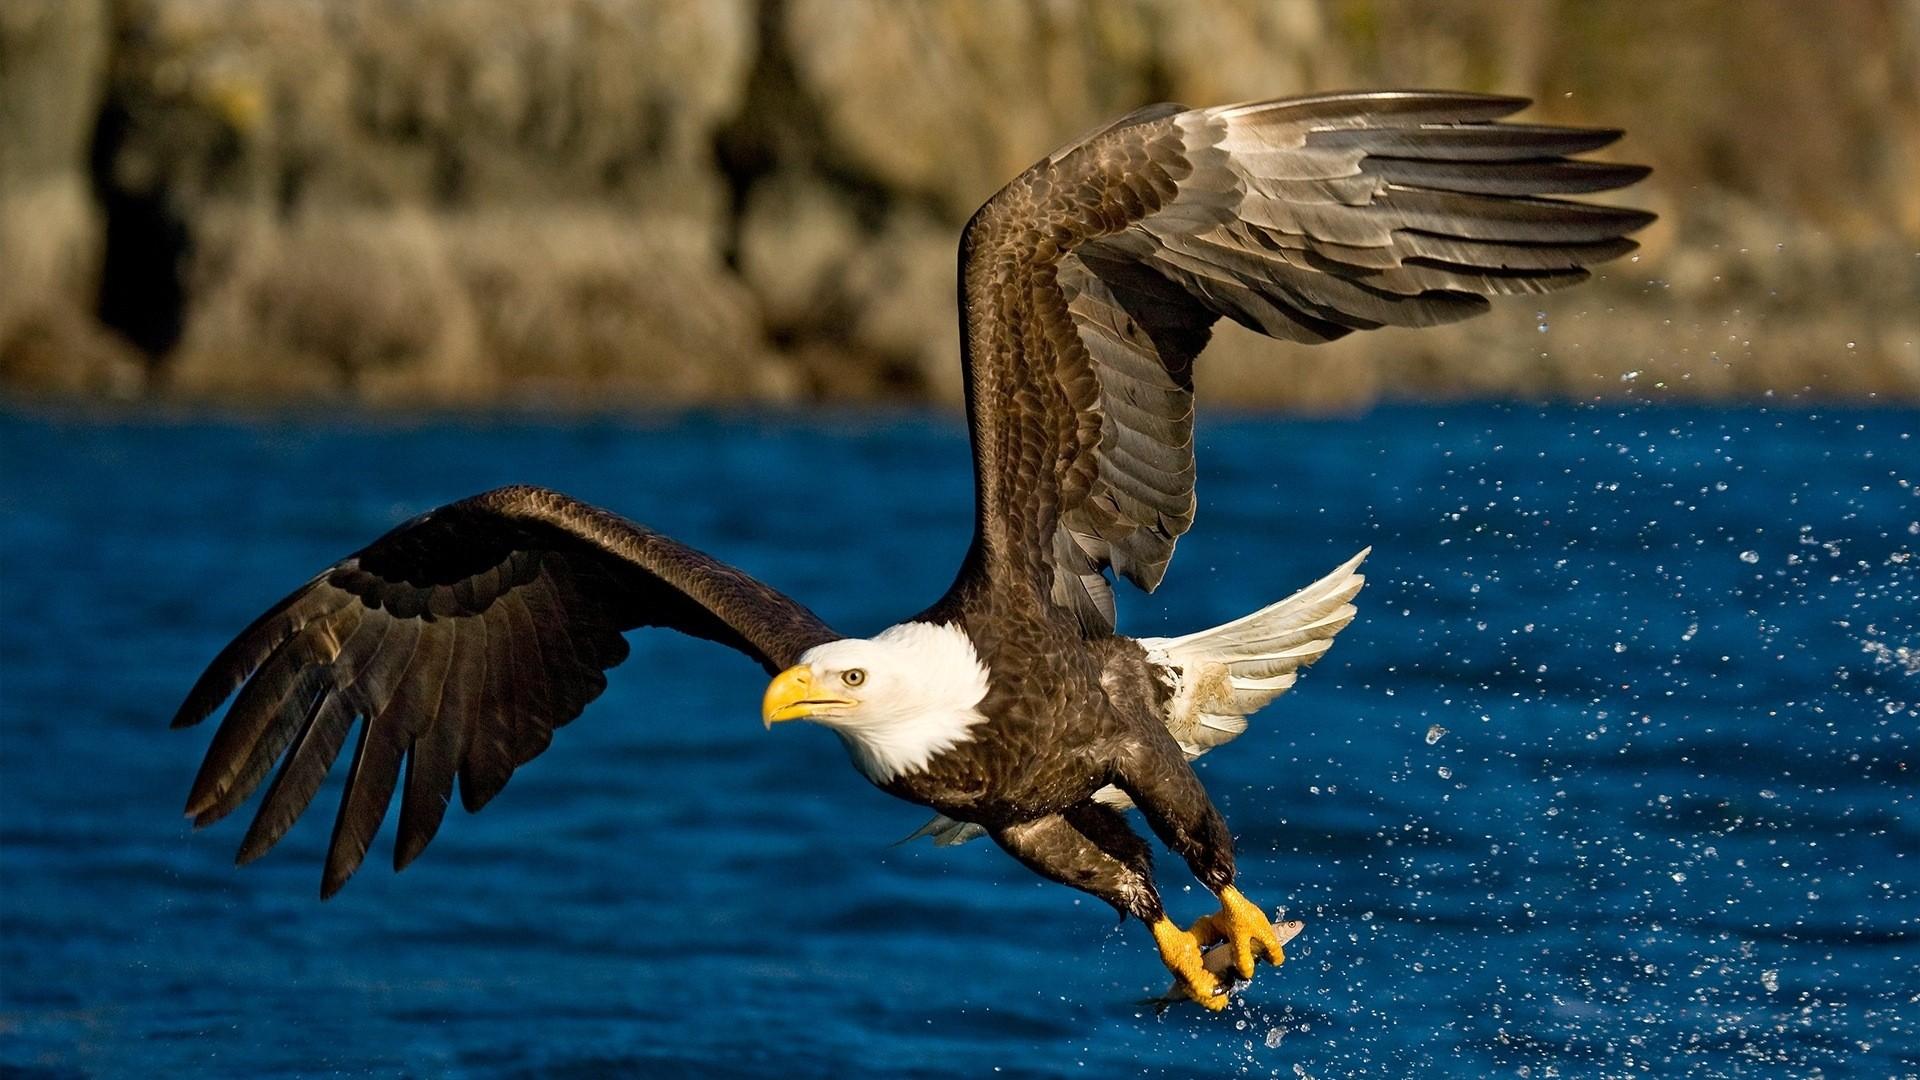 Eagle Full HD Wallpaper